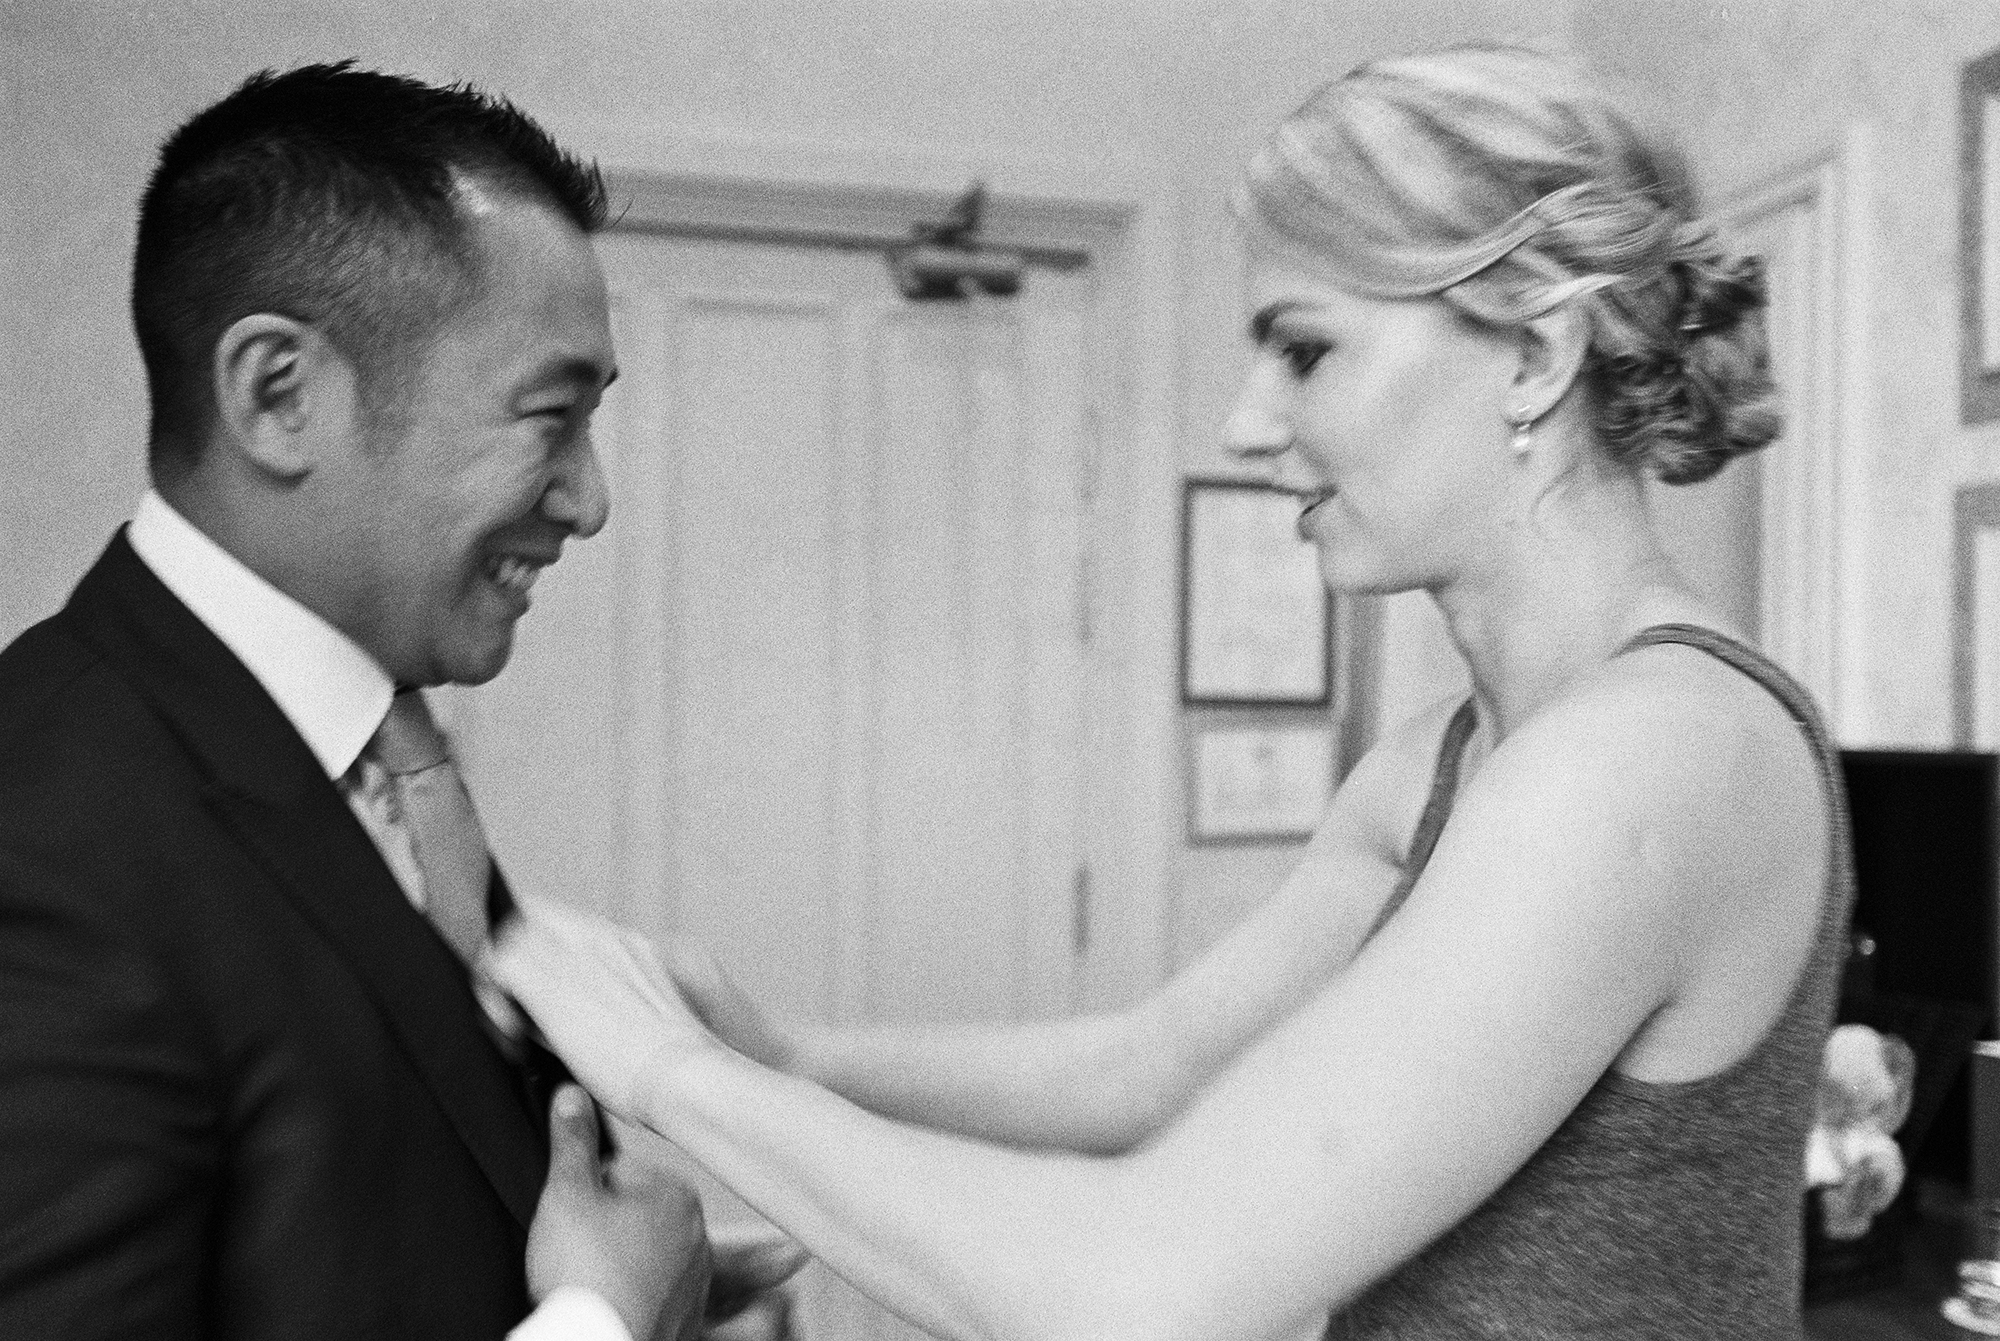 wedding_photographer_cumbria012.jpg